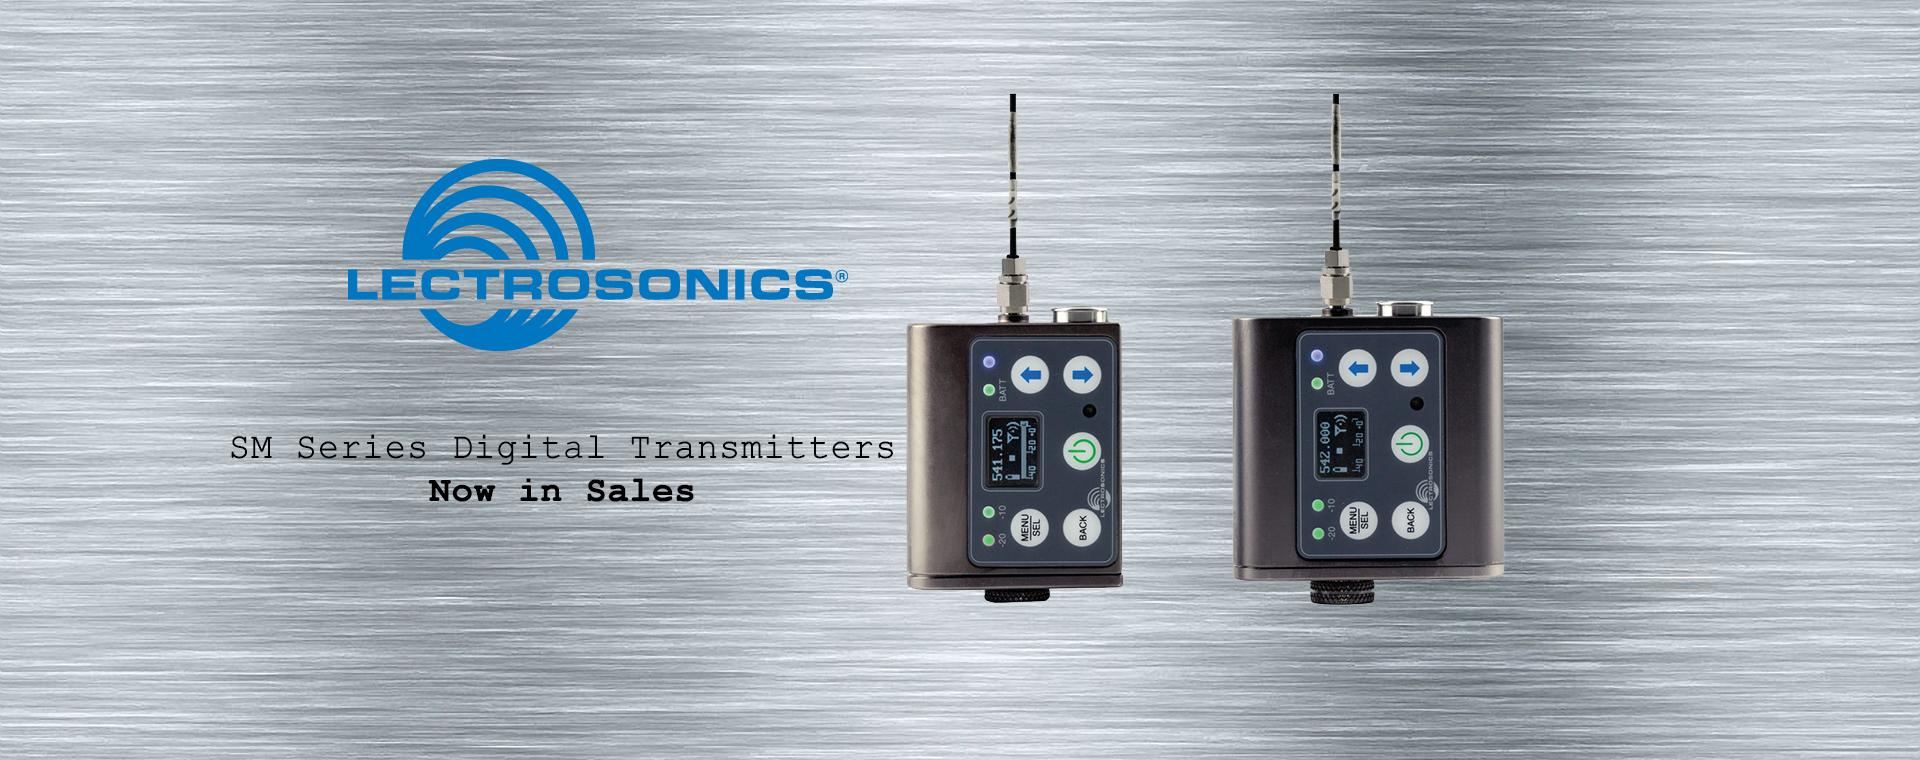 Lectrosonics SM Series Digital Transmitters